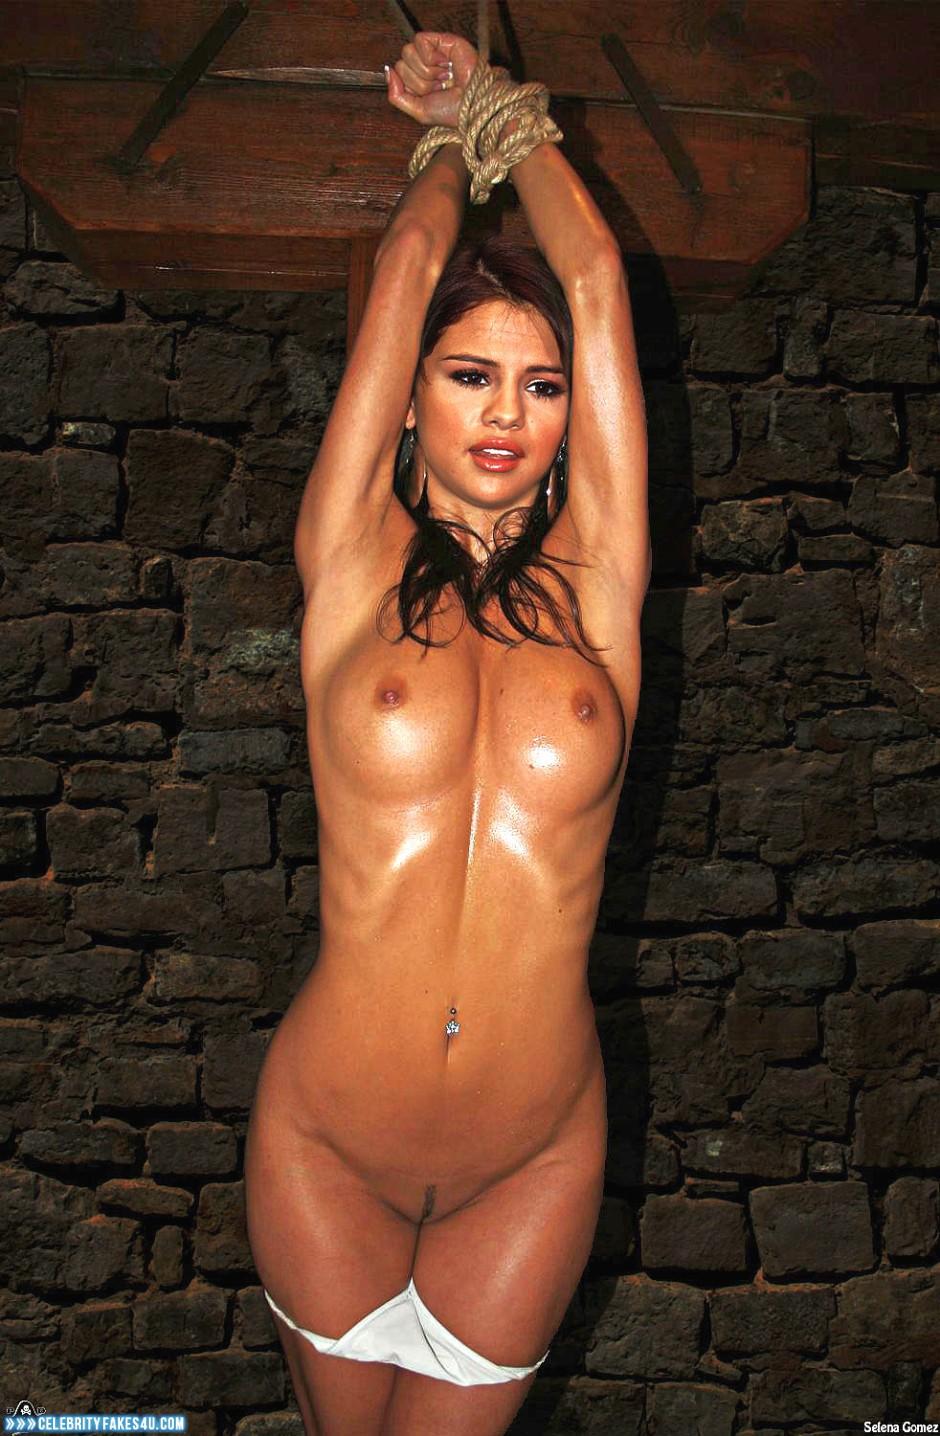 selena gomez hogtied nude